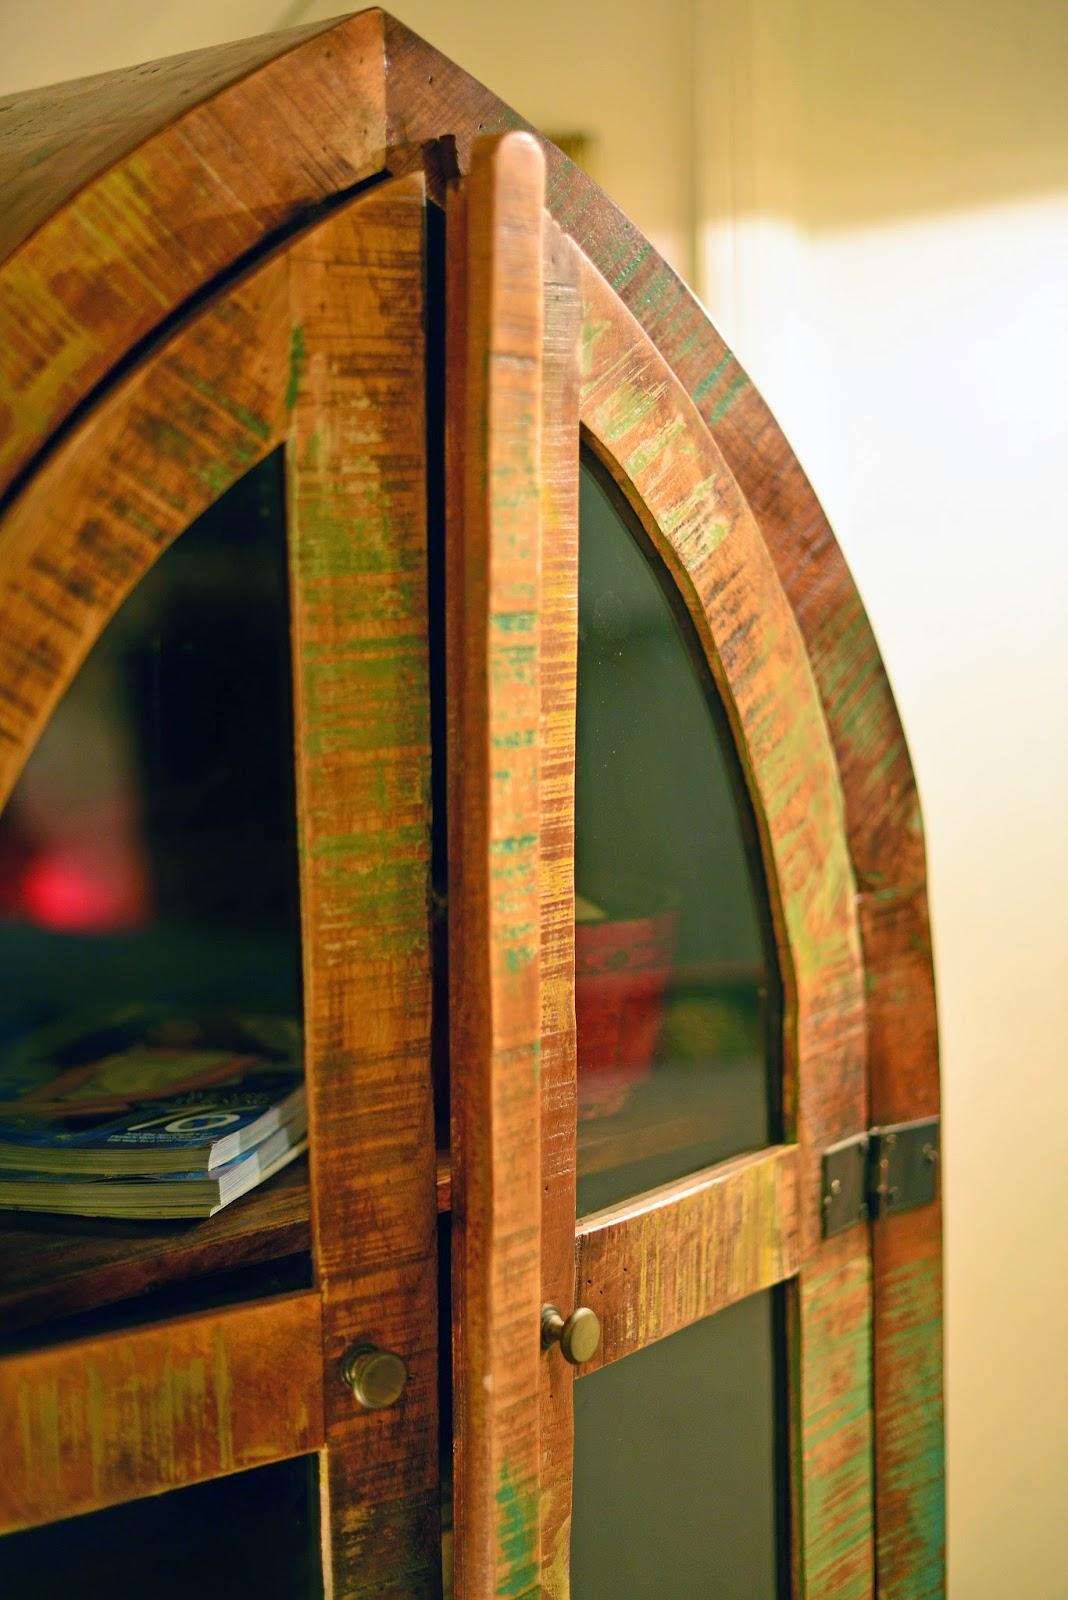 saal wood, reclaimed wood book shelf